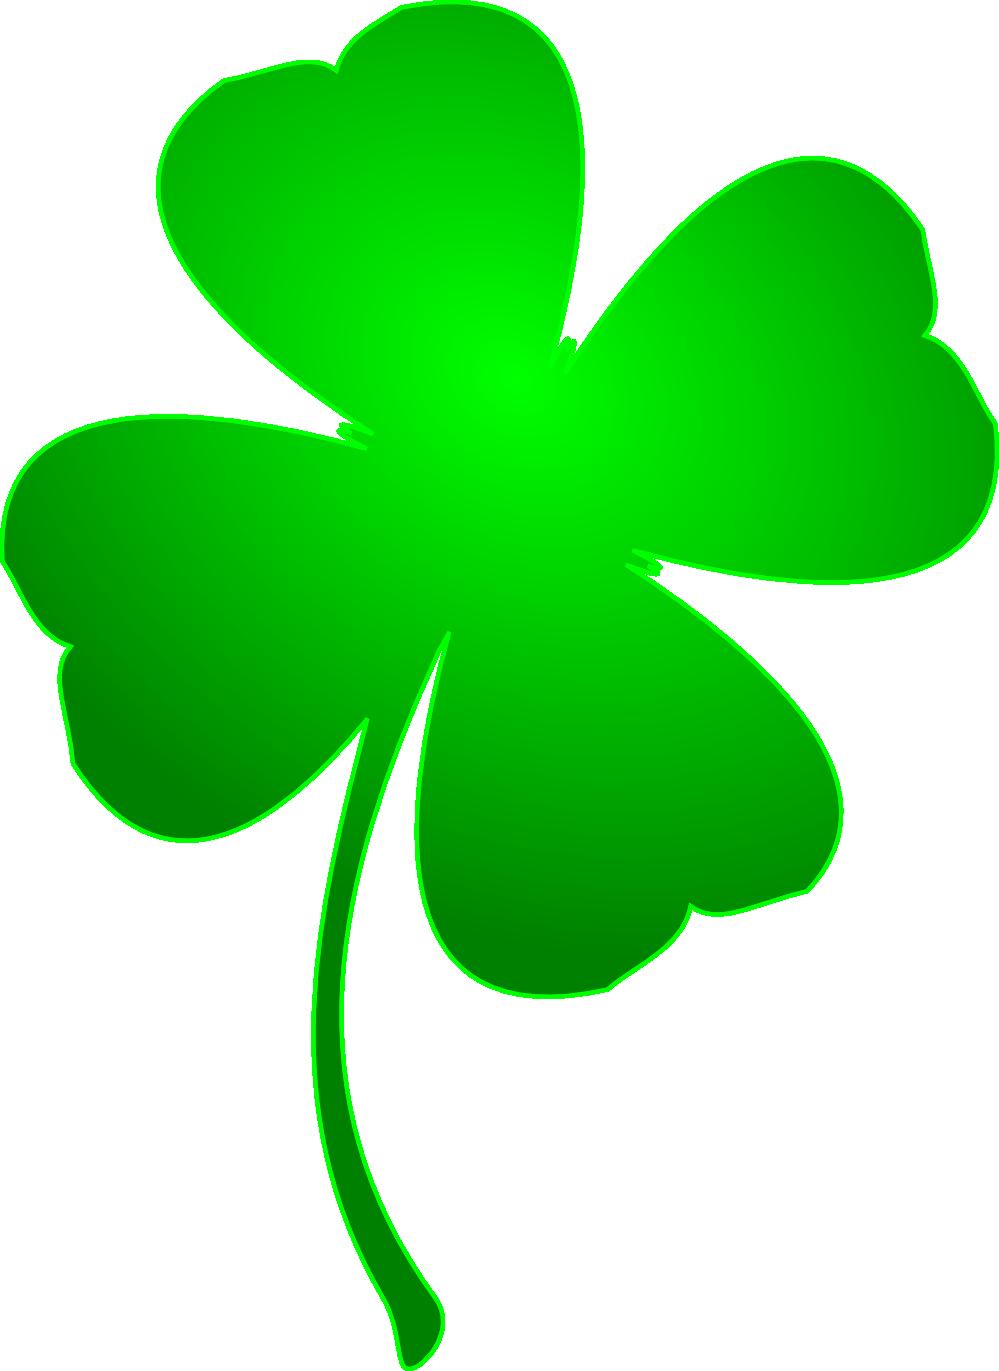 Symbol clipart irish Lucky Saint Patricks 109(K) Paper